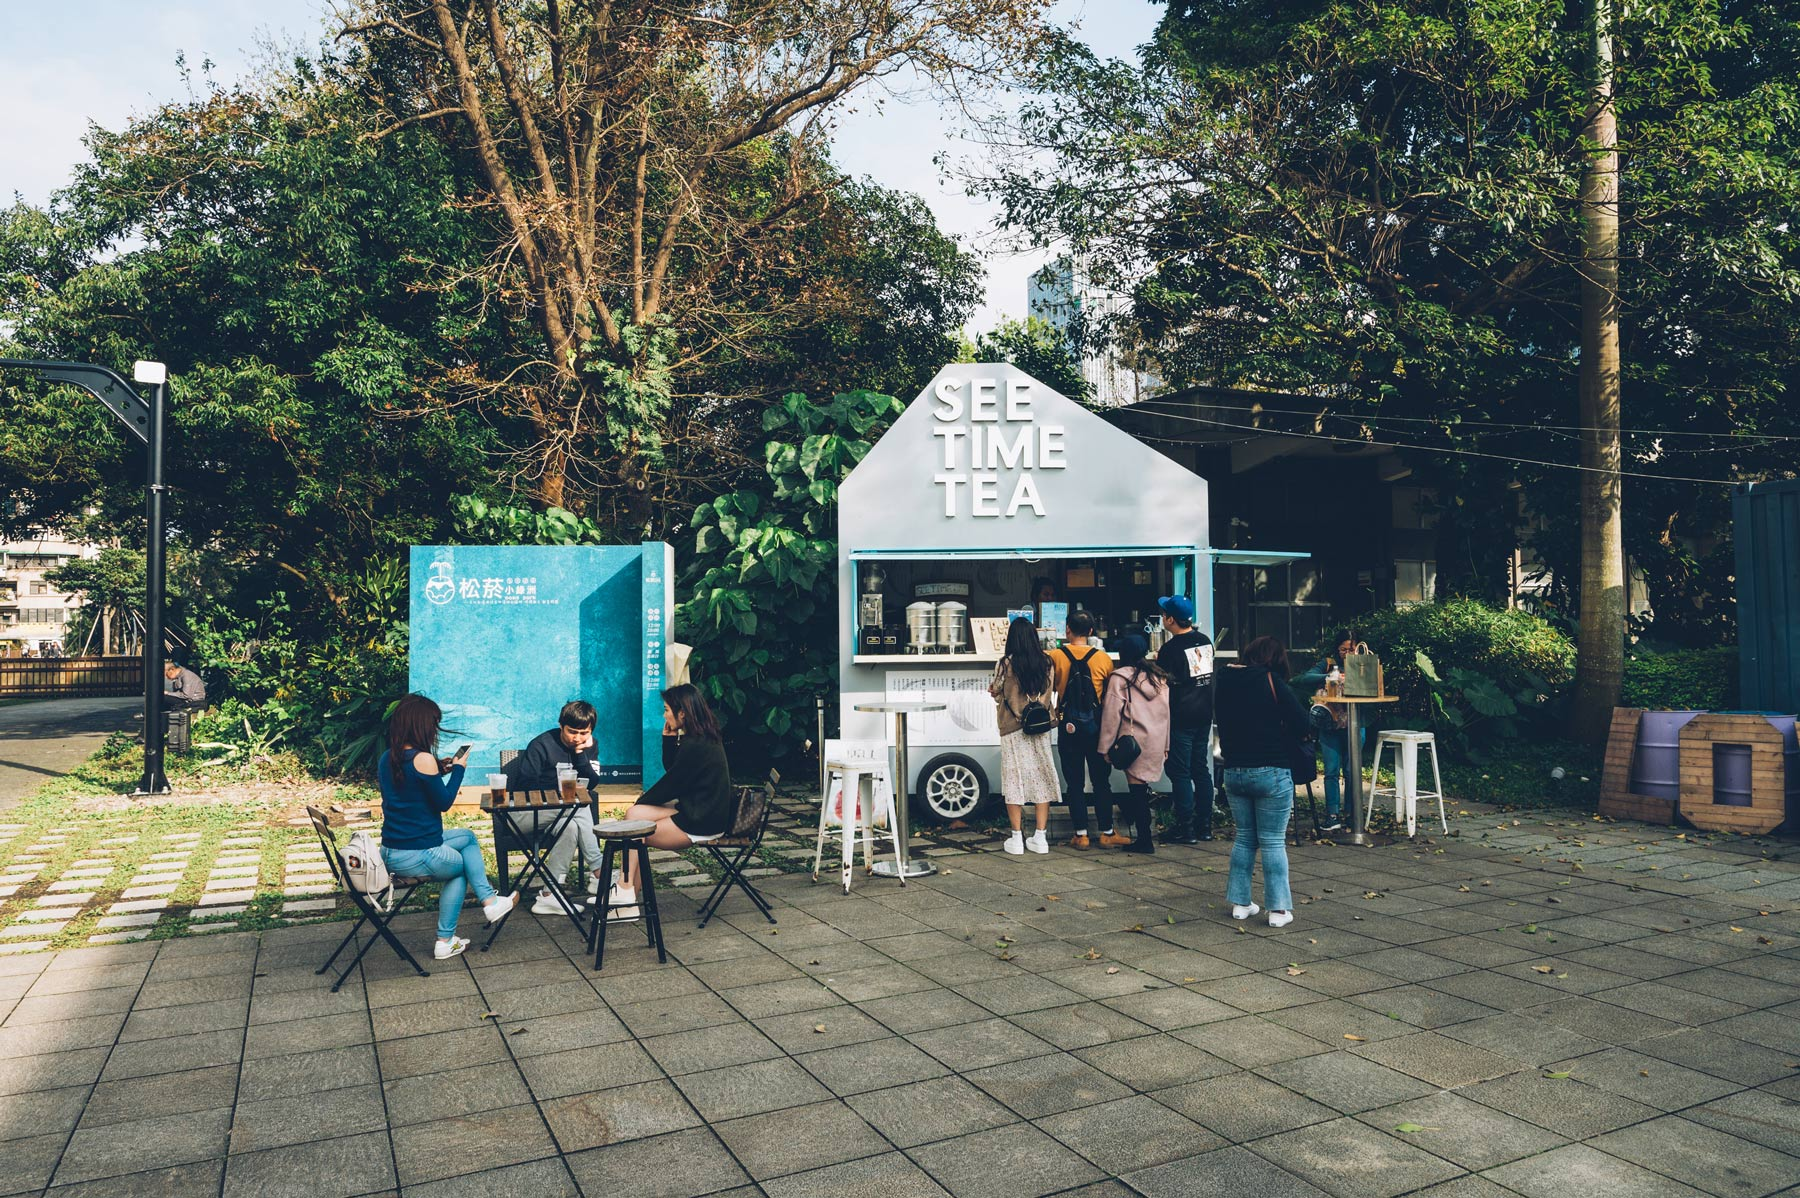 Songshan Cultural & Creative Park